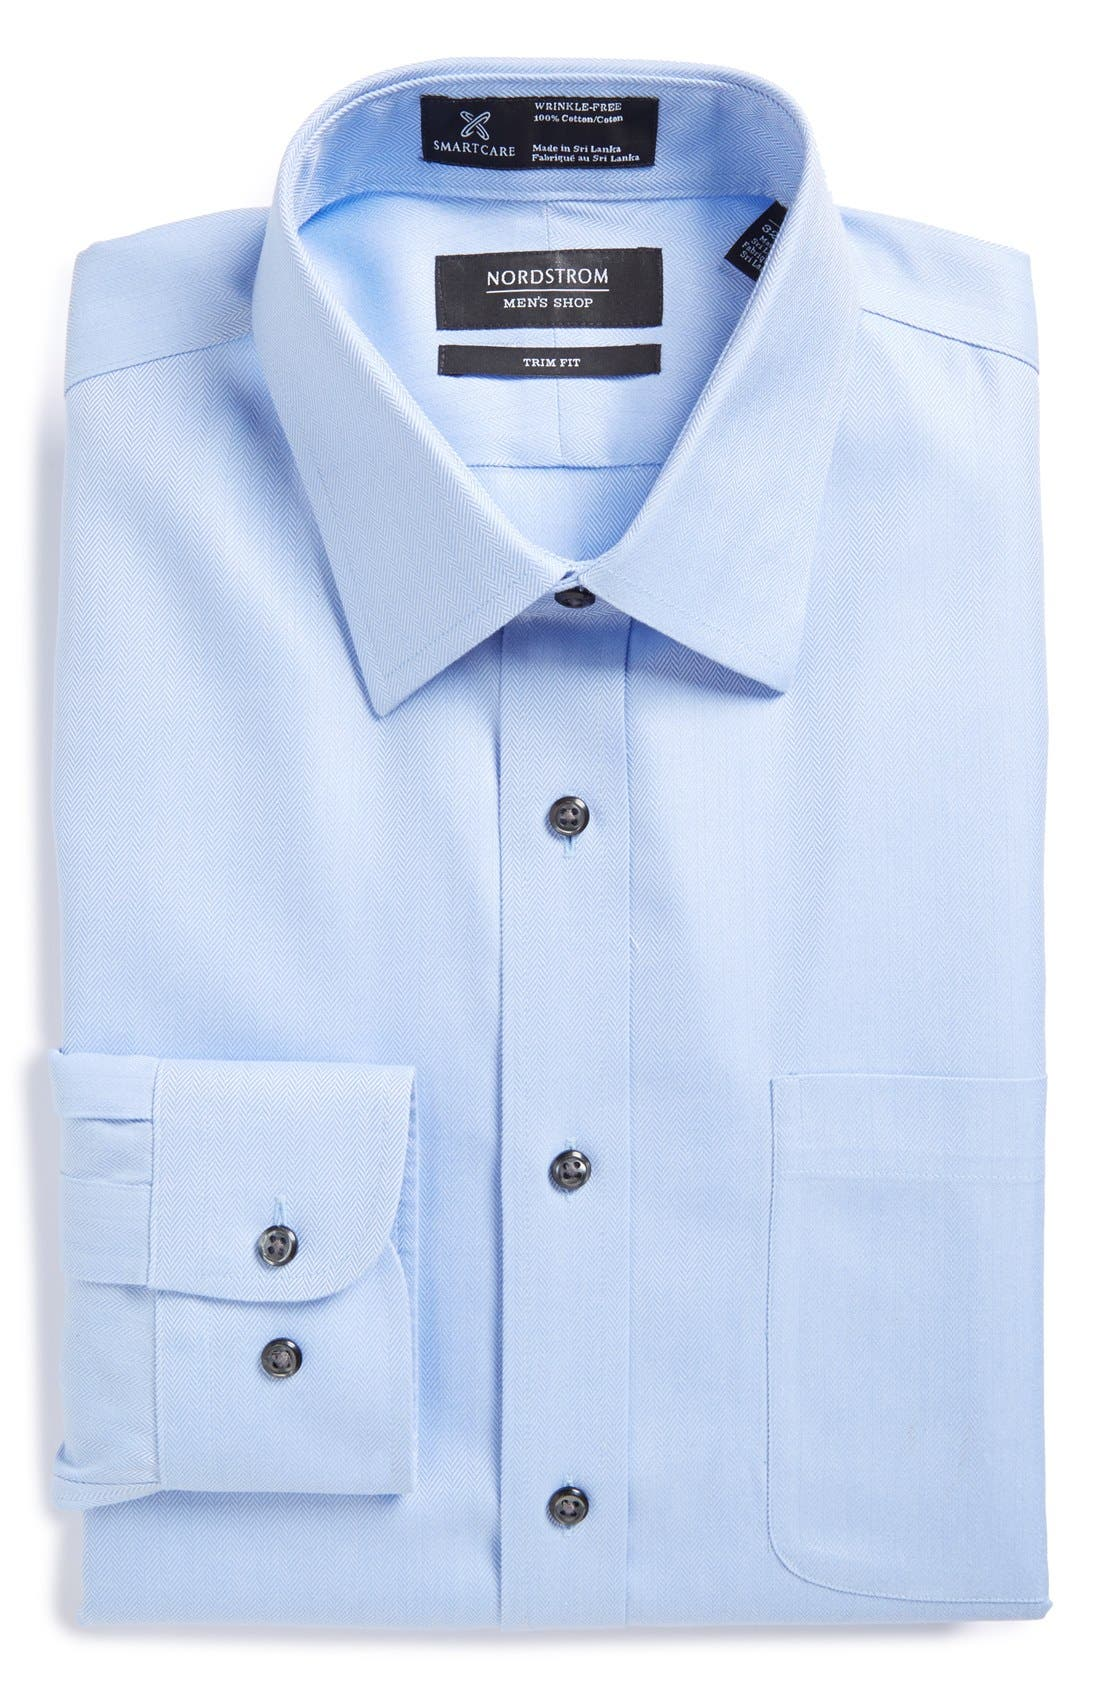 Nordstrom Menu0026#39;s Shop Smartcareu2122 Trim Fit Herringbone Dress Shirt | Nordstrom